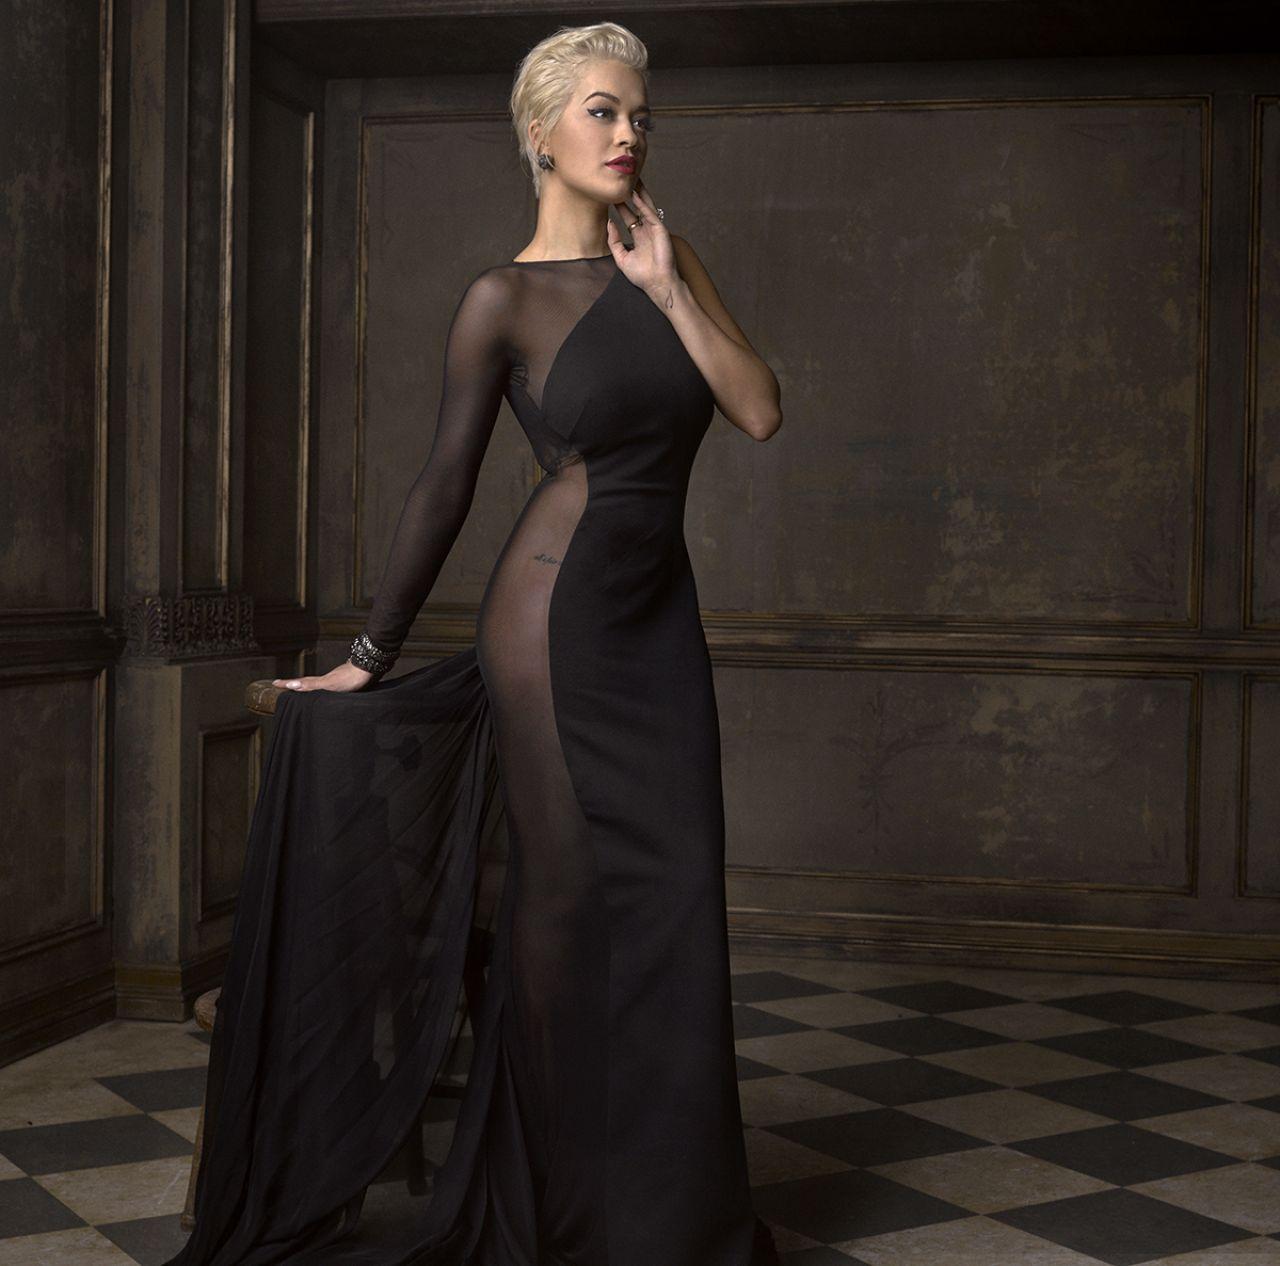 2015 Vanity Fair Oscar Party Portraits